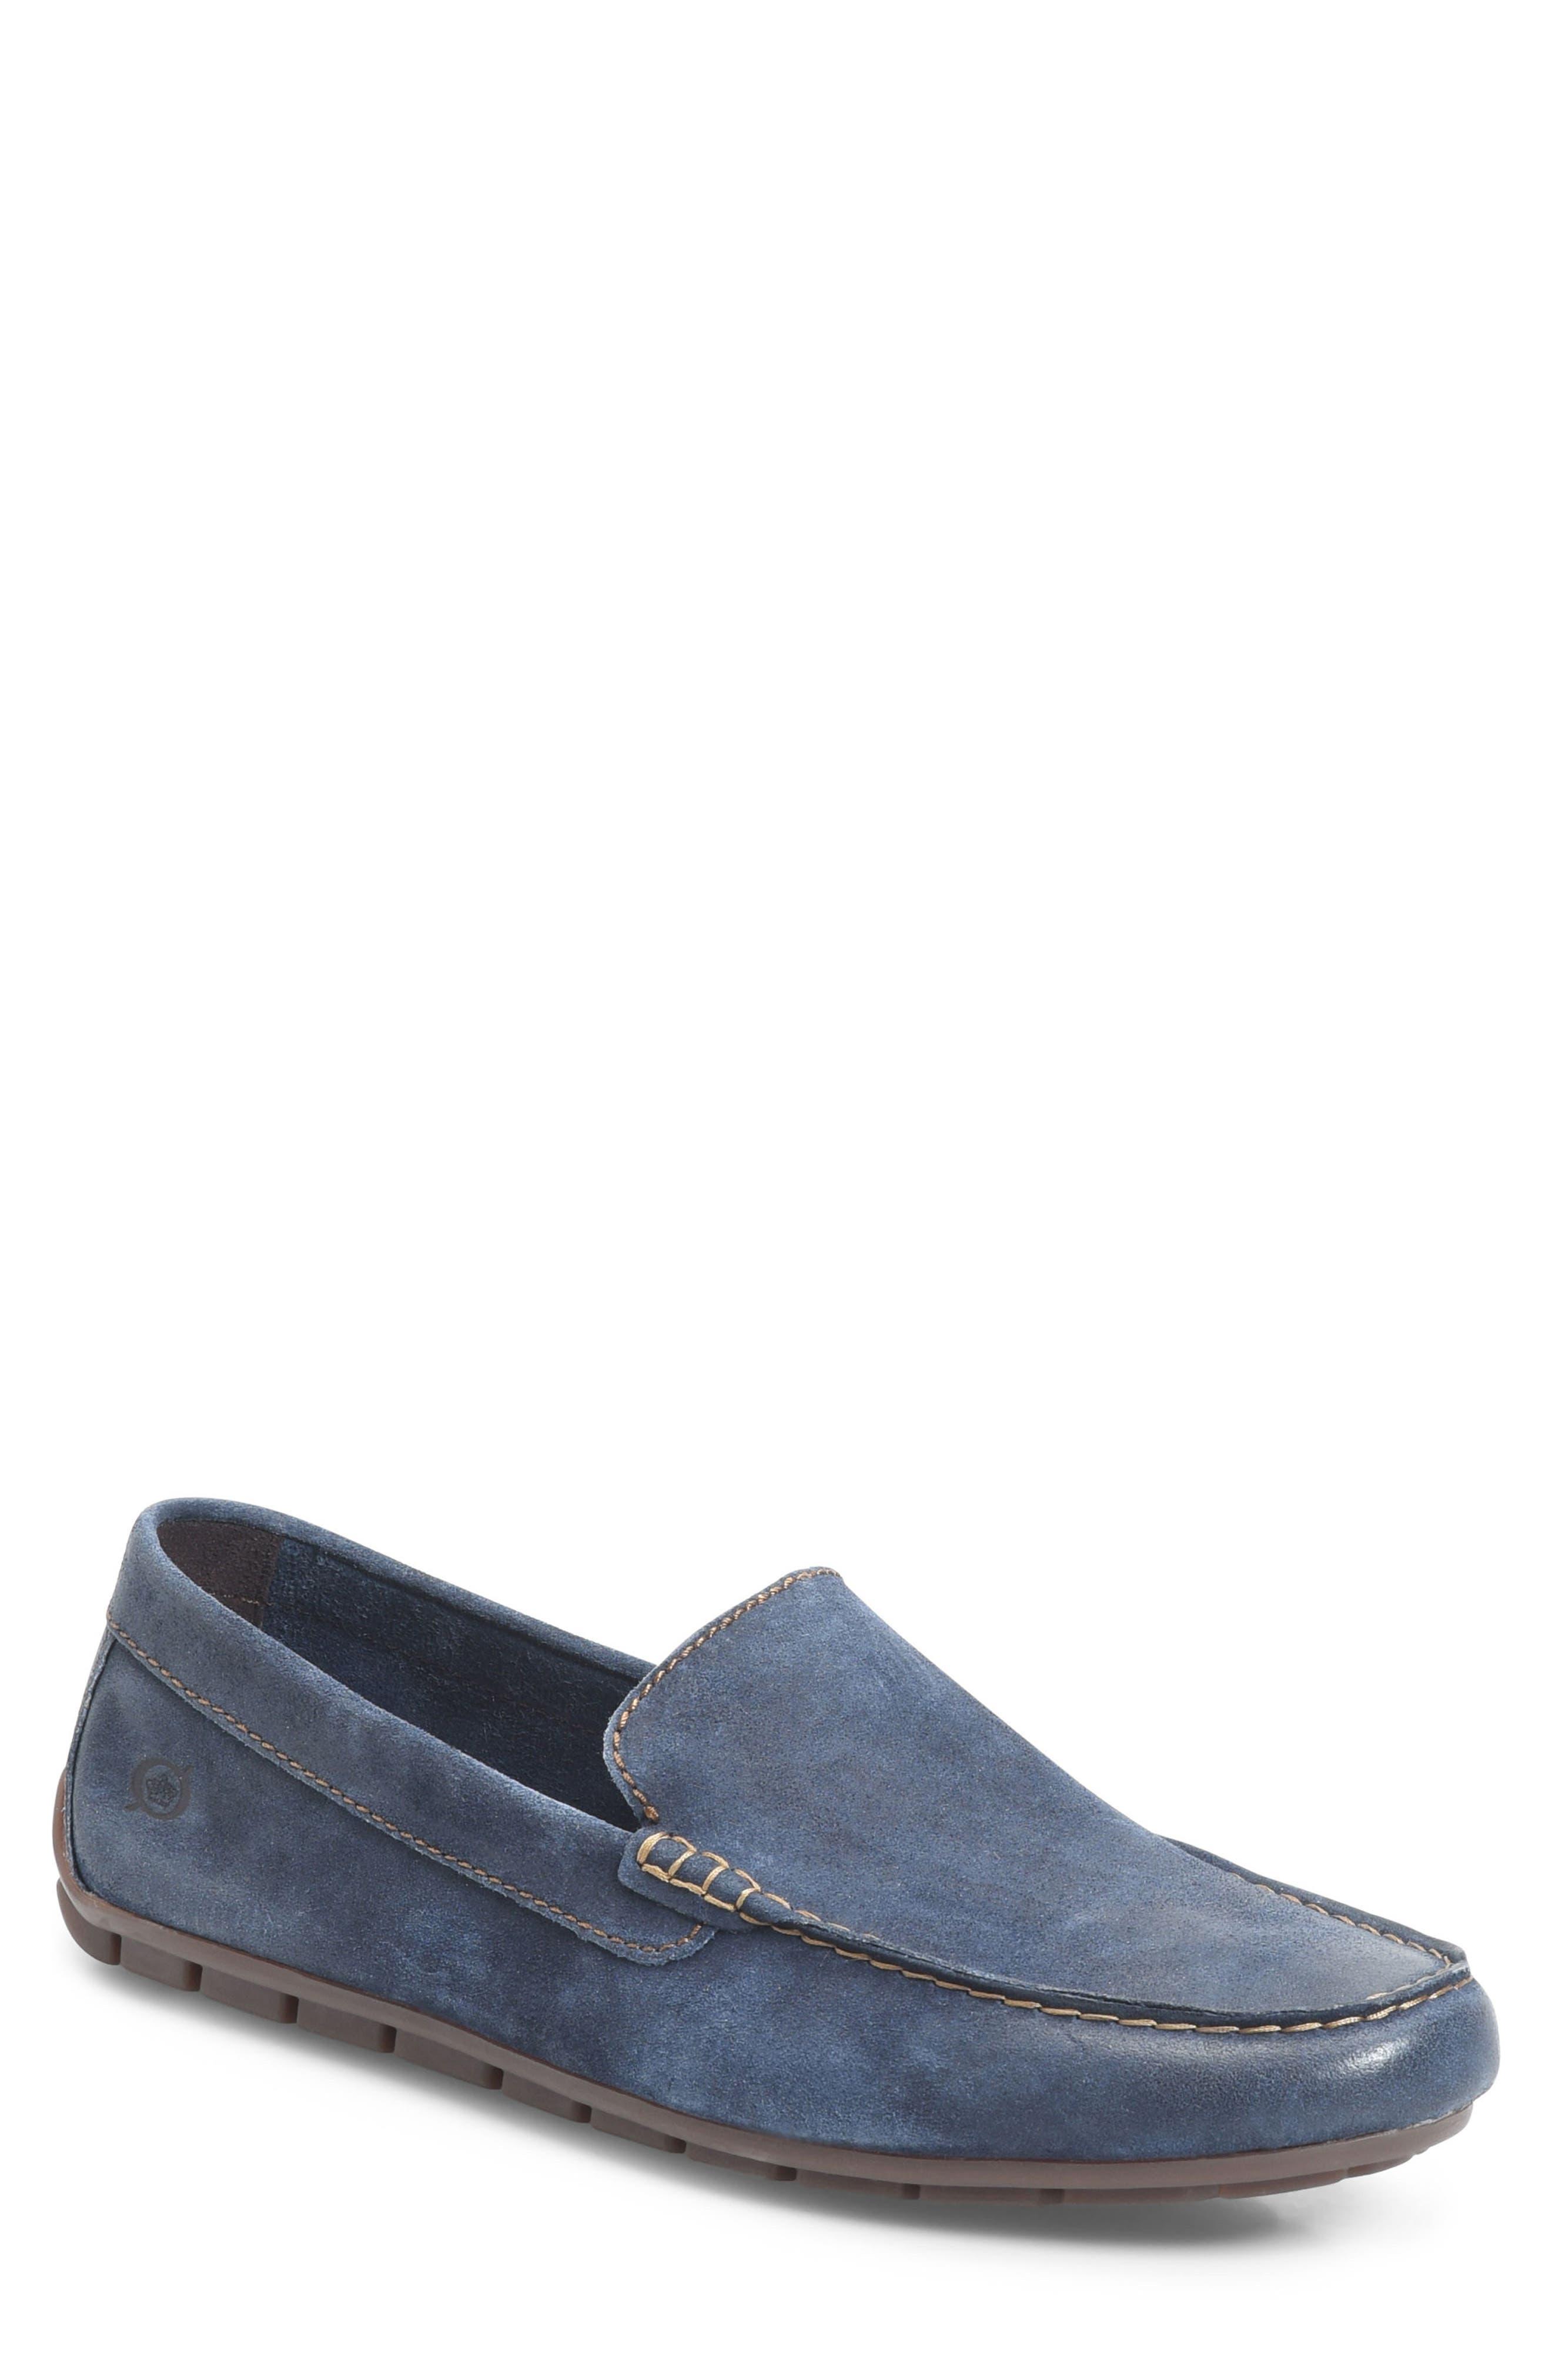 'Allan' Slip-On,                         Main,                         color, Blue Distressed